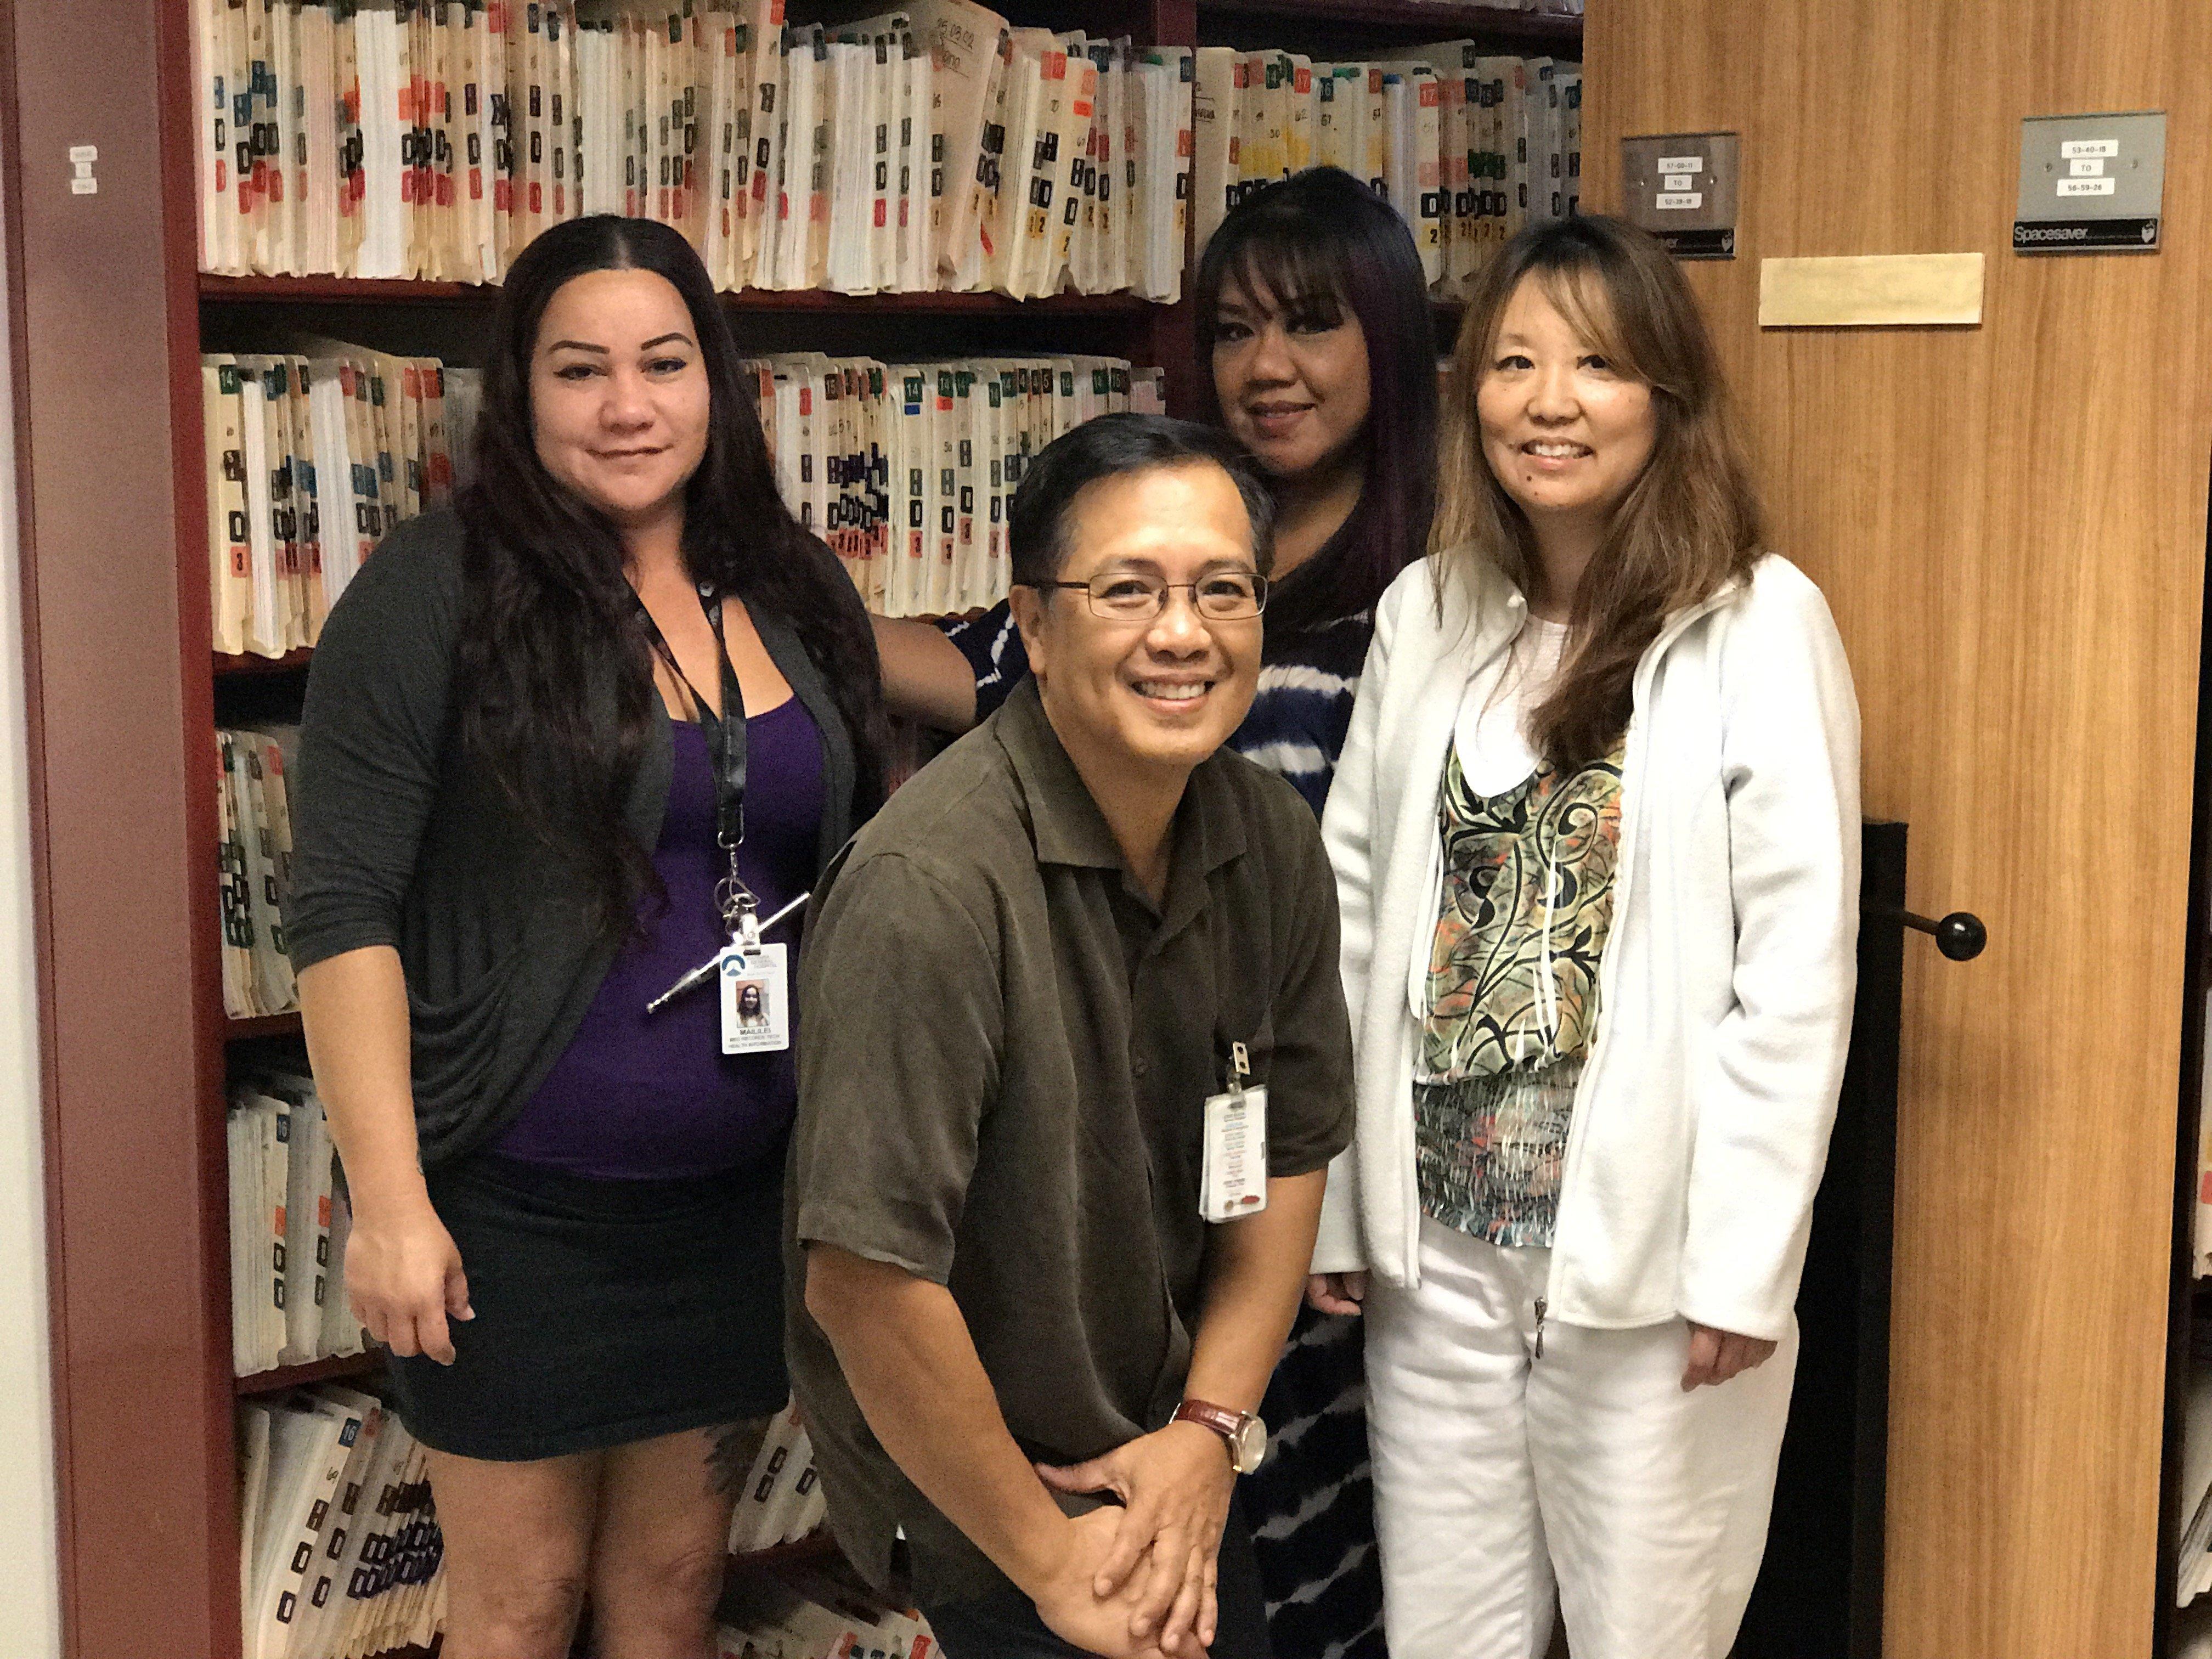 Medical Records Team